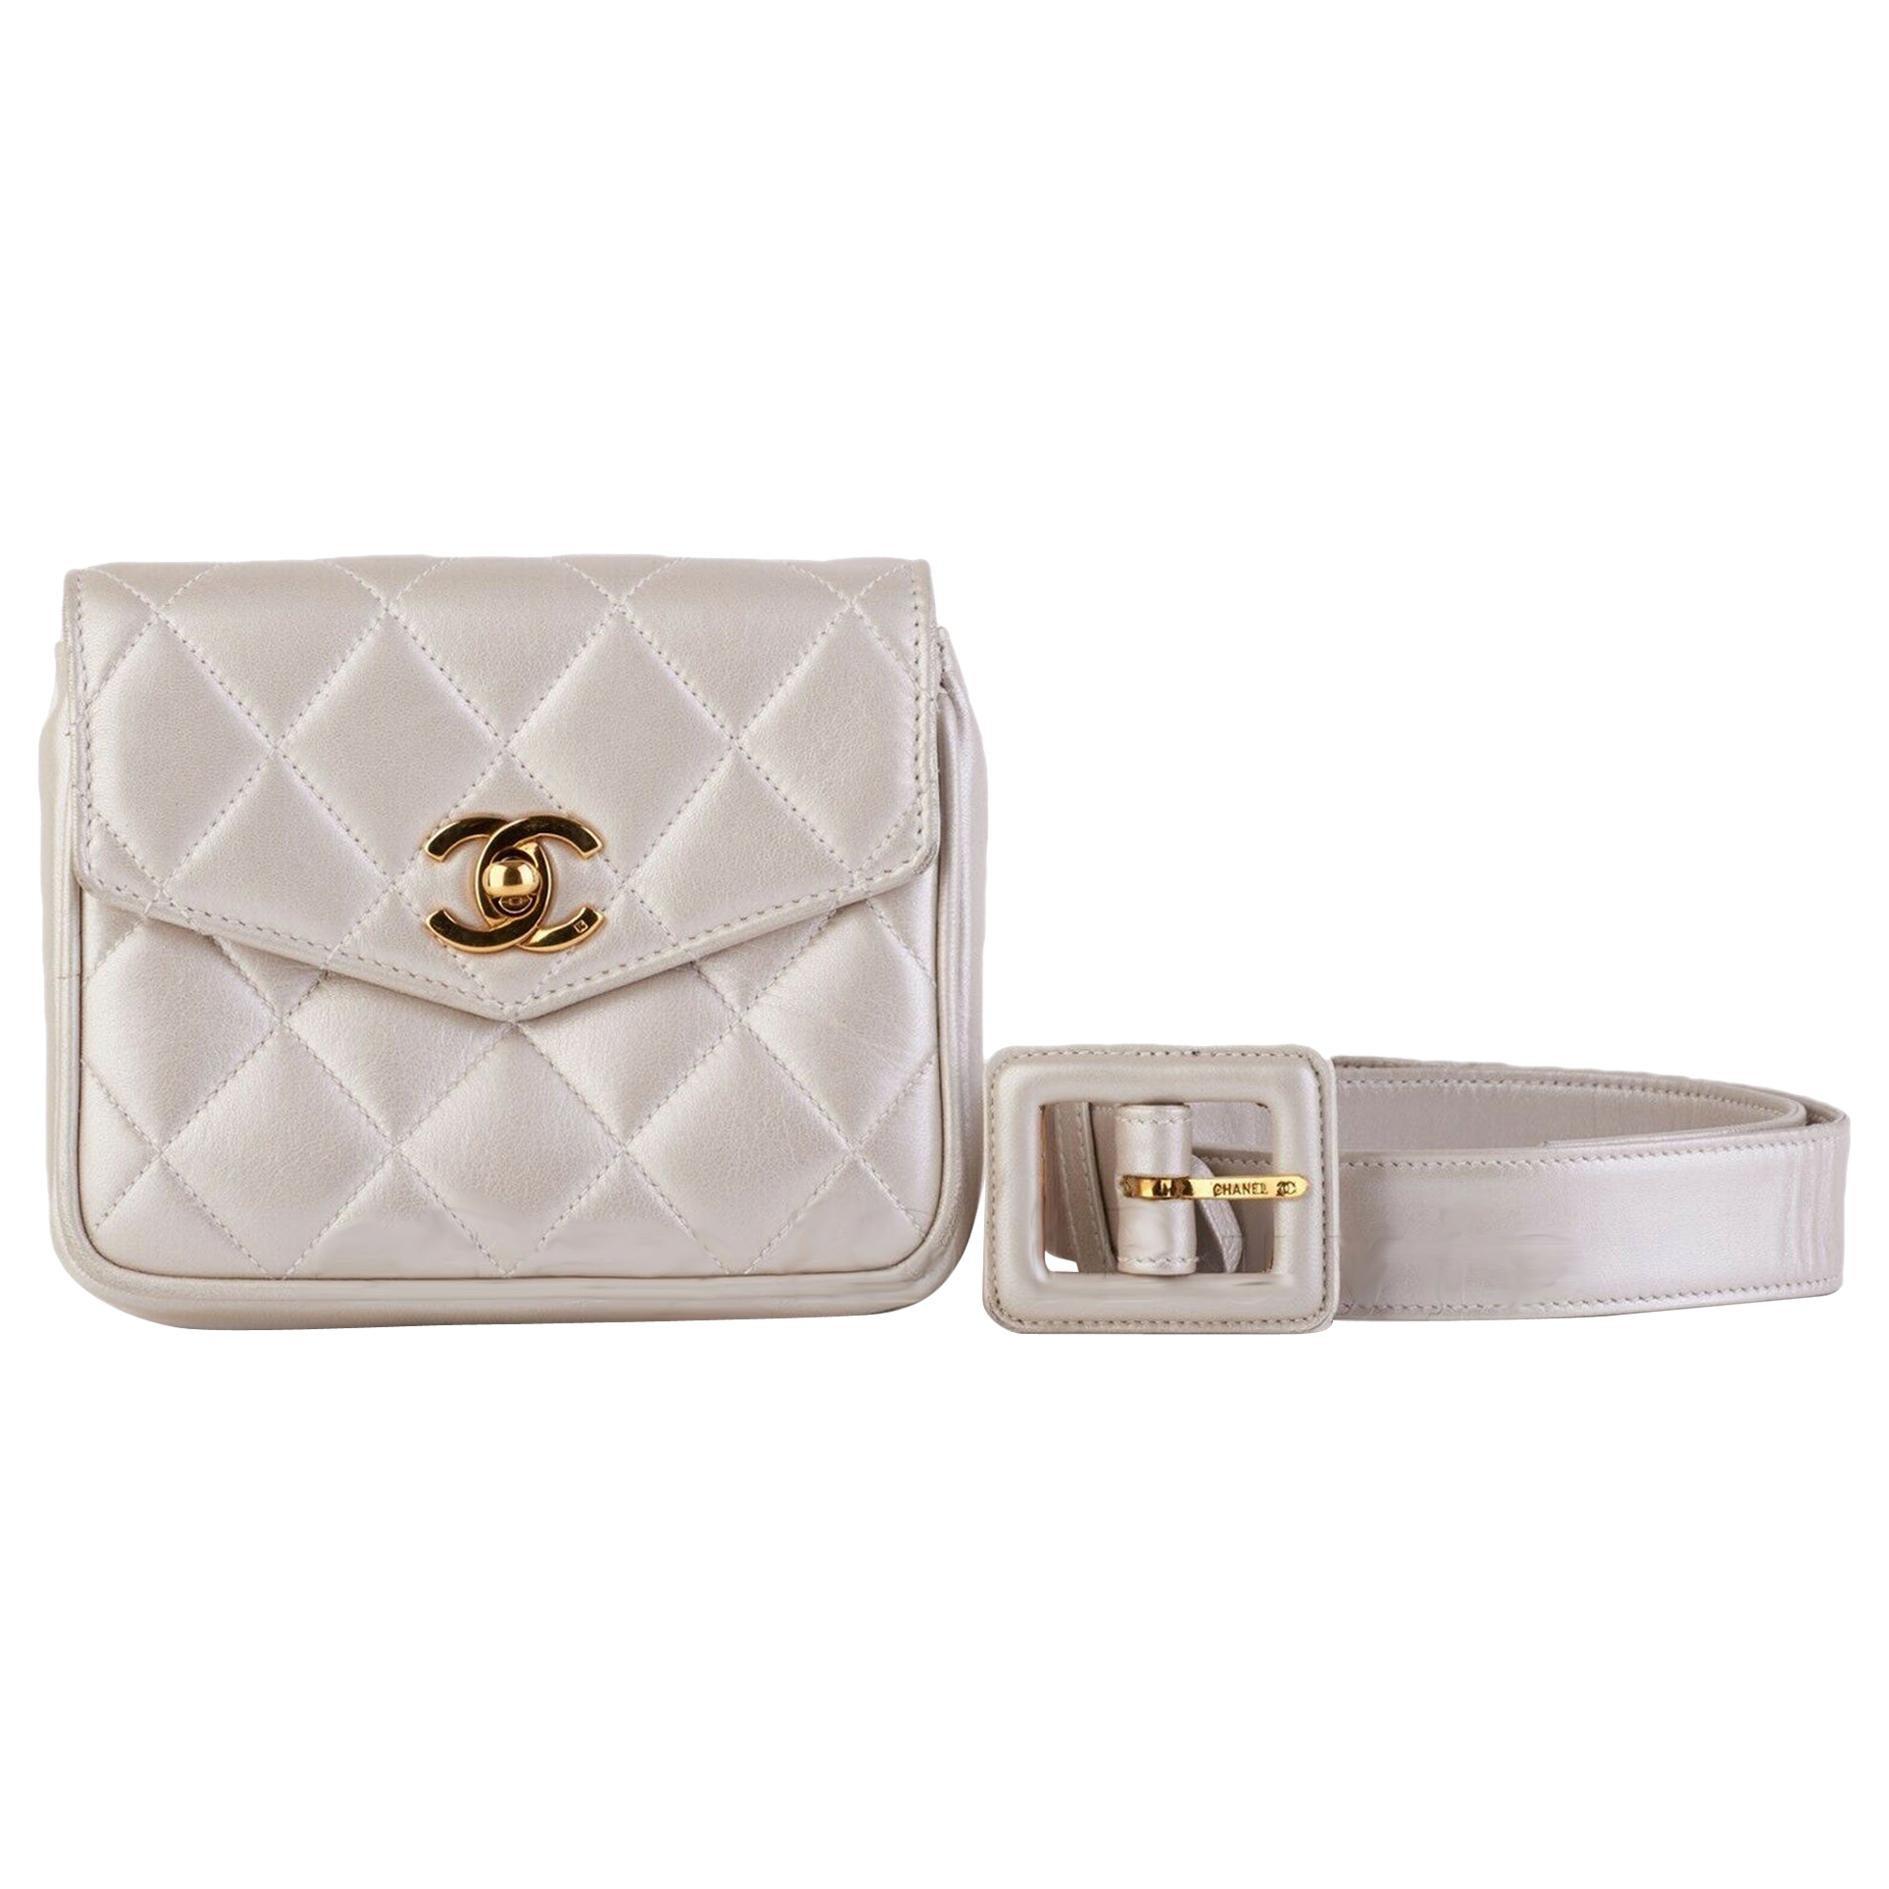 Chanel Rare Vintage Iridescent Champagne Pearl Mini Belt Bum Bag Fanny Pack